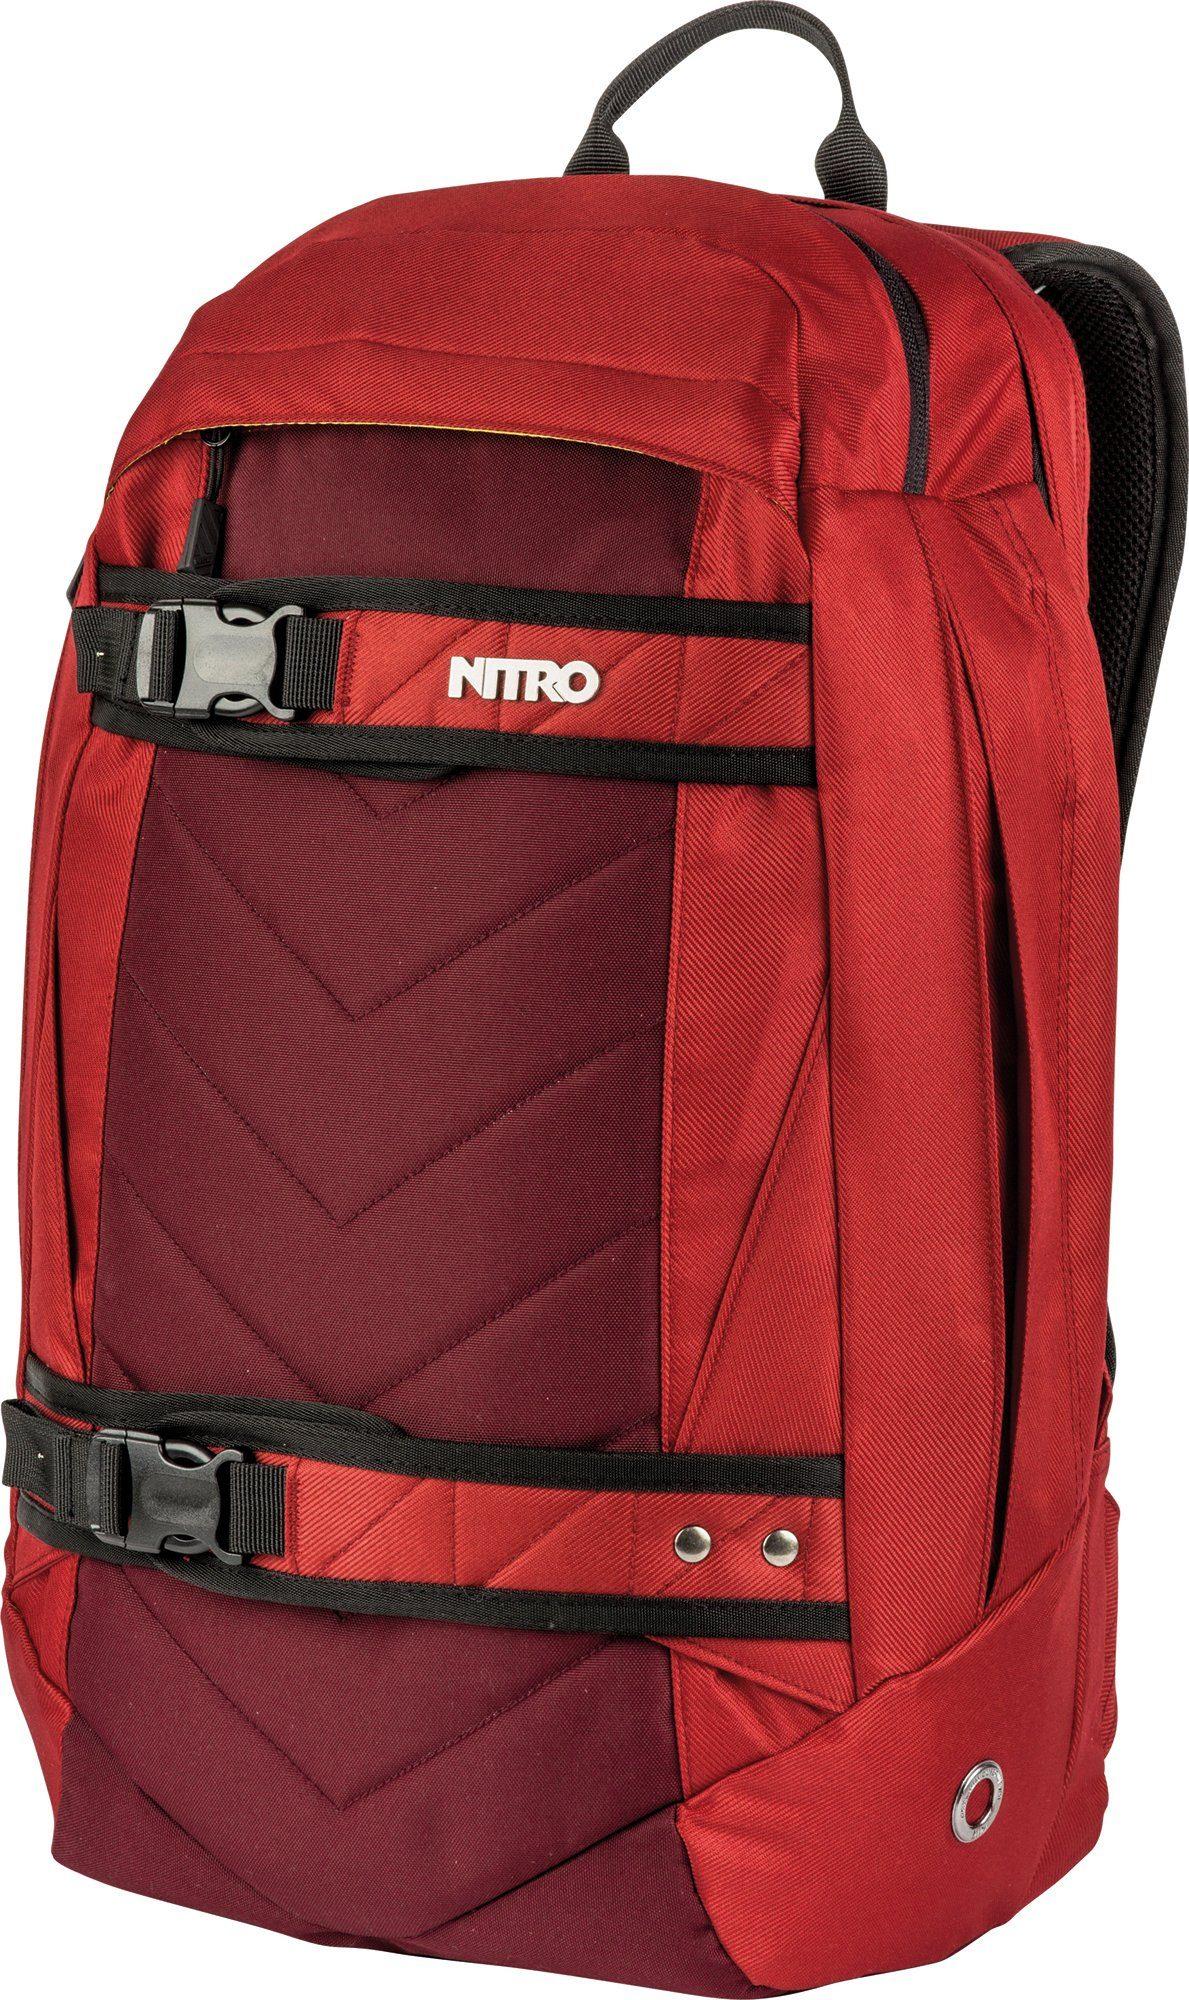 Nitro Rucksack, »Aerial Chili«